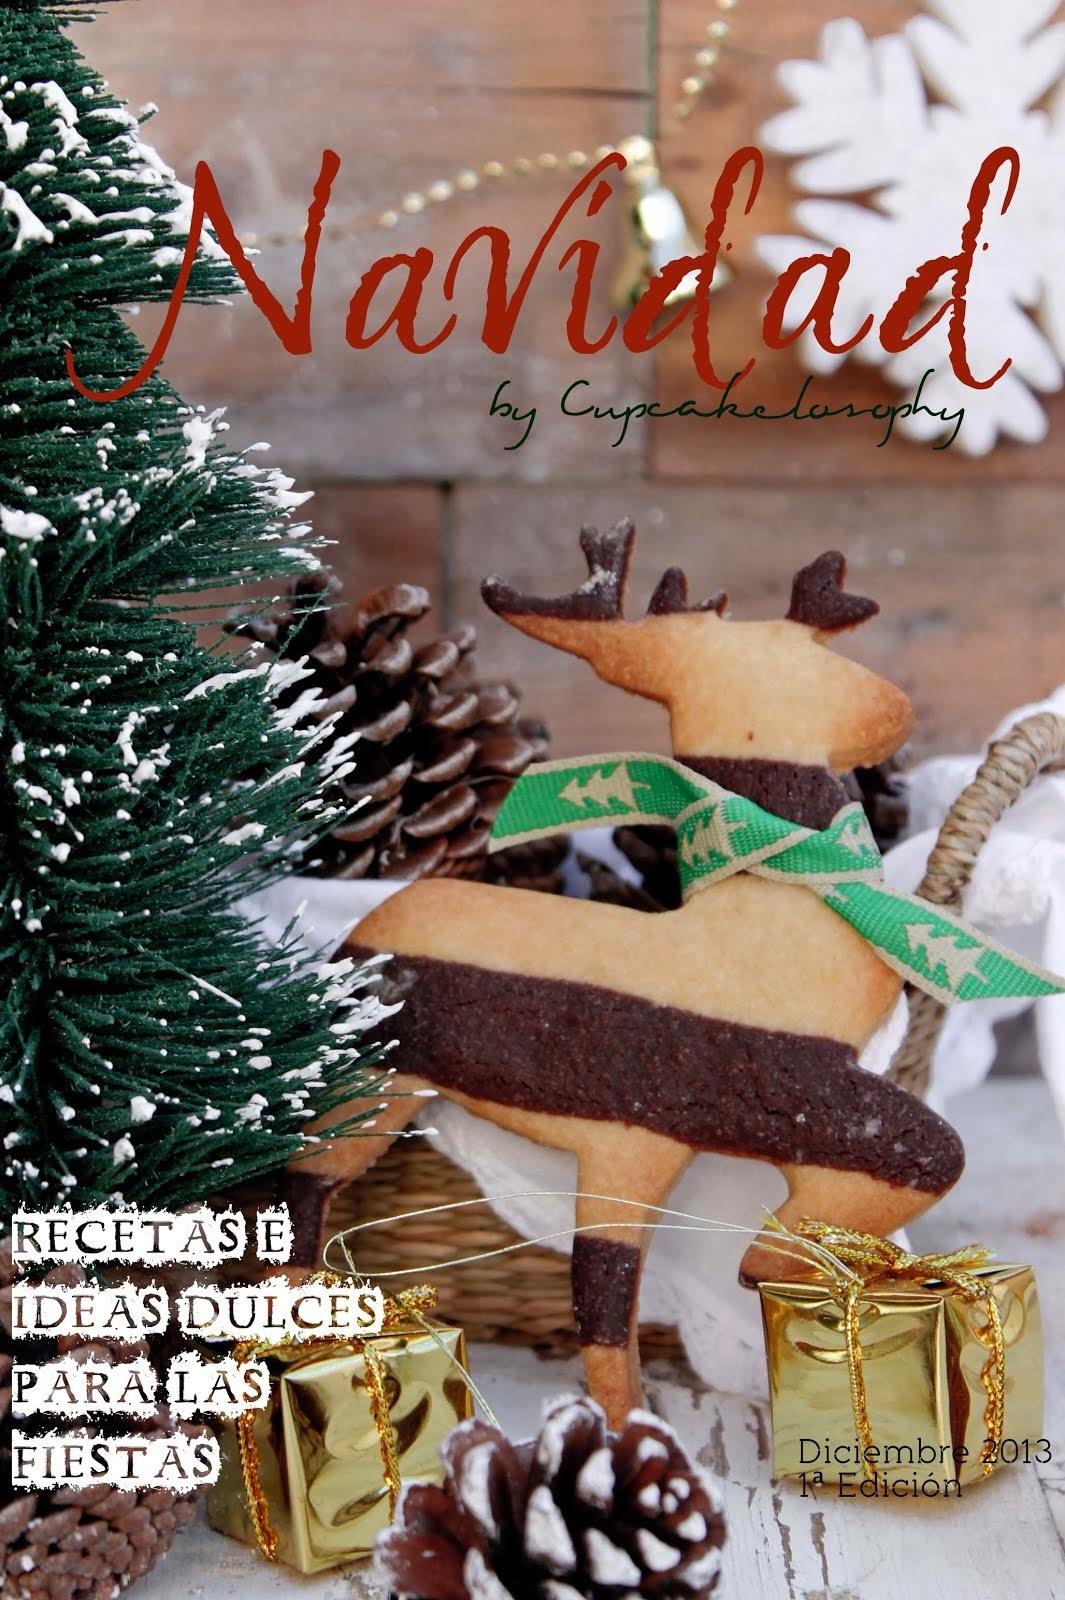 Revista Navidad 2013